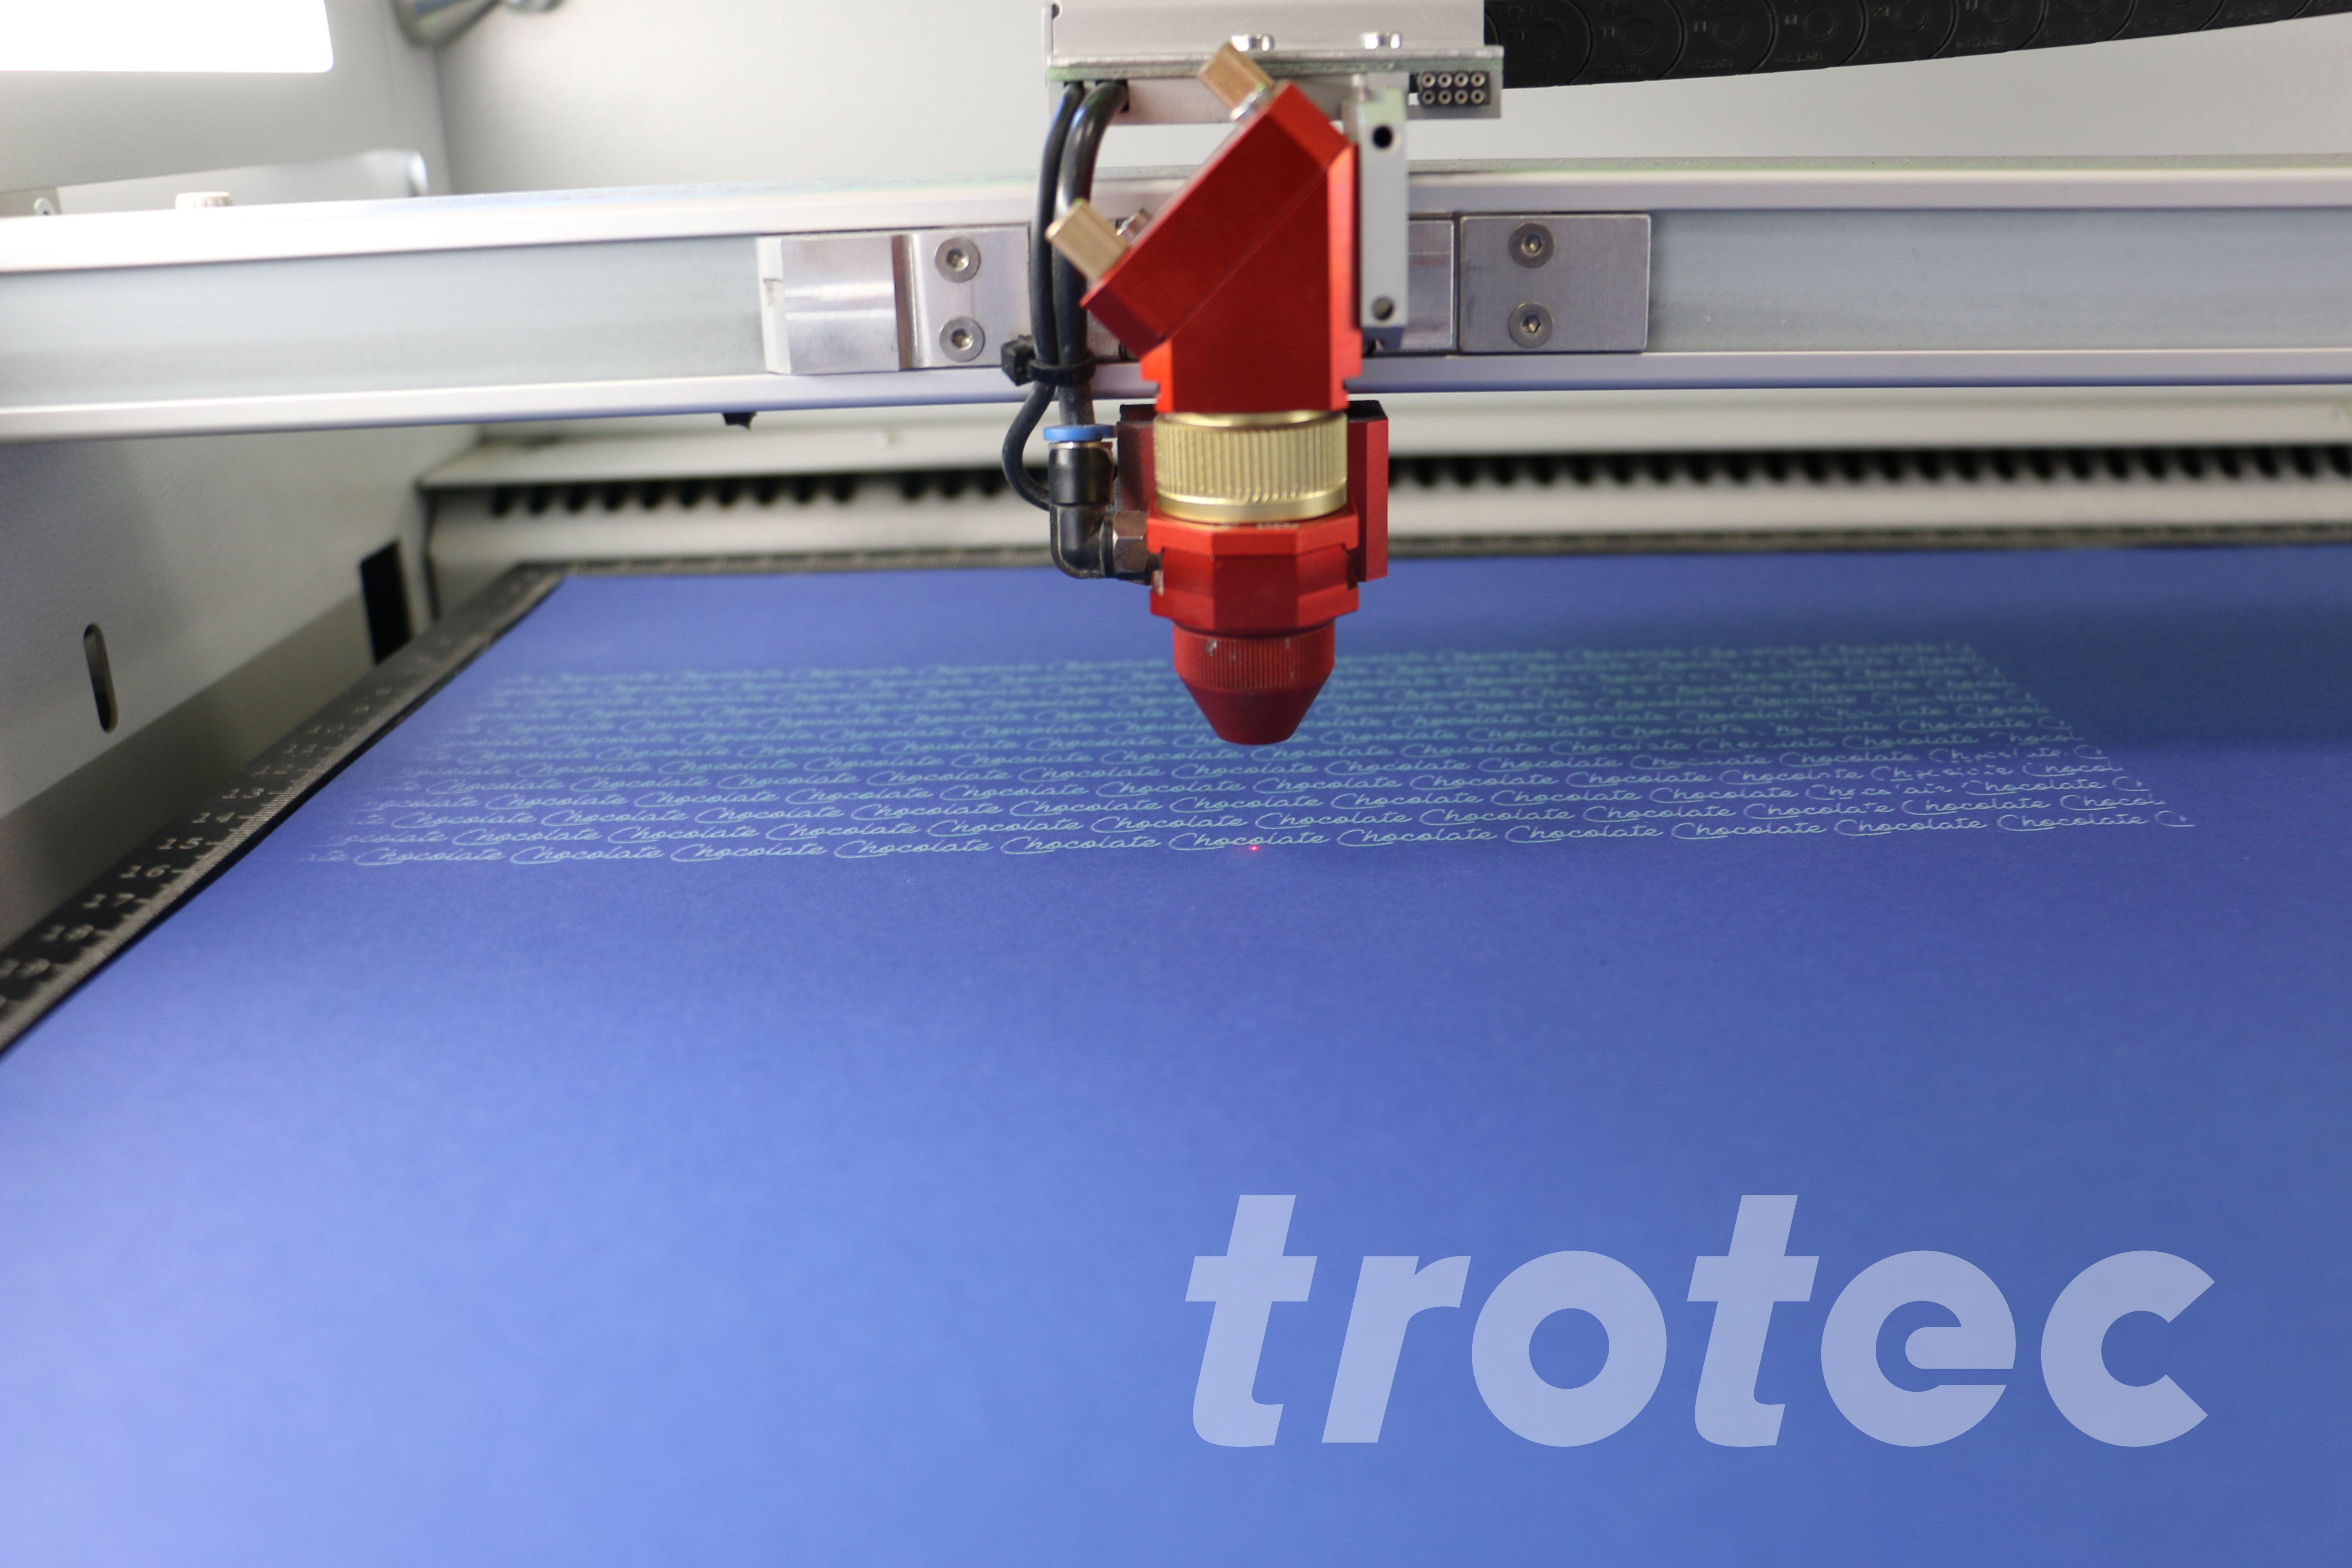 Pin Auf Diy Paper Laser Cutting And Engraving Ideas